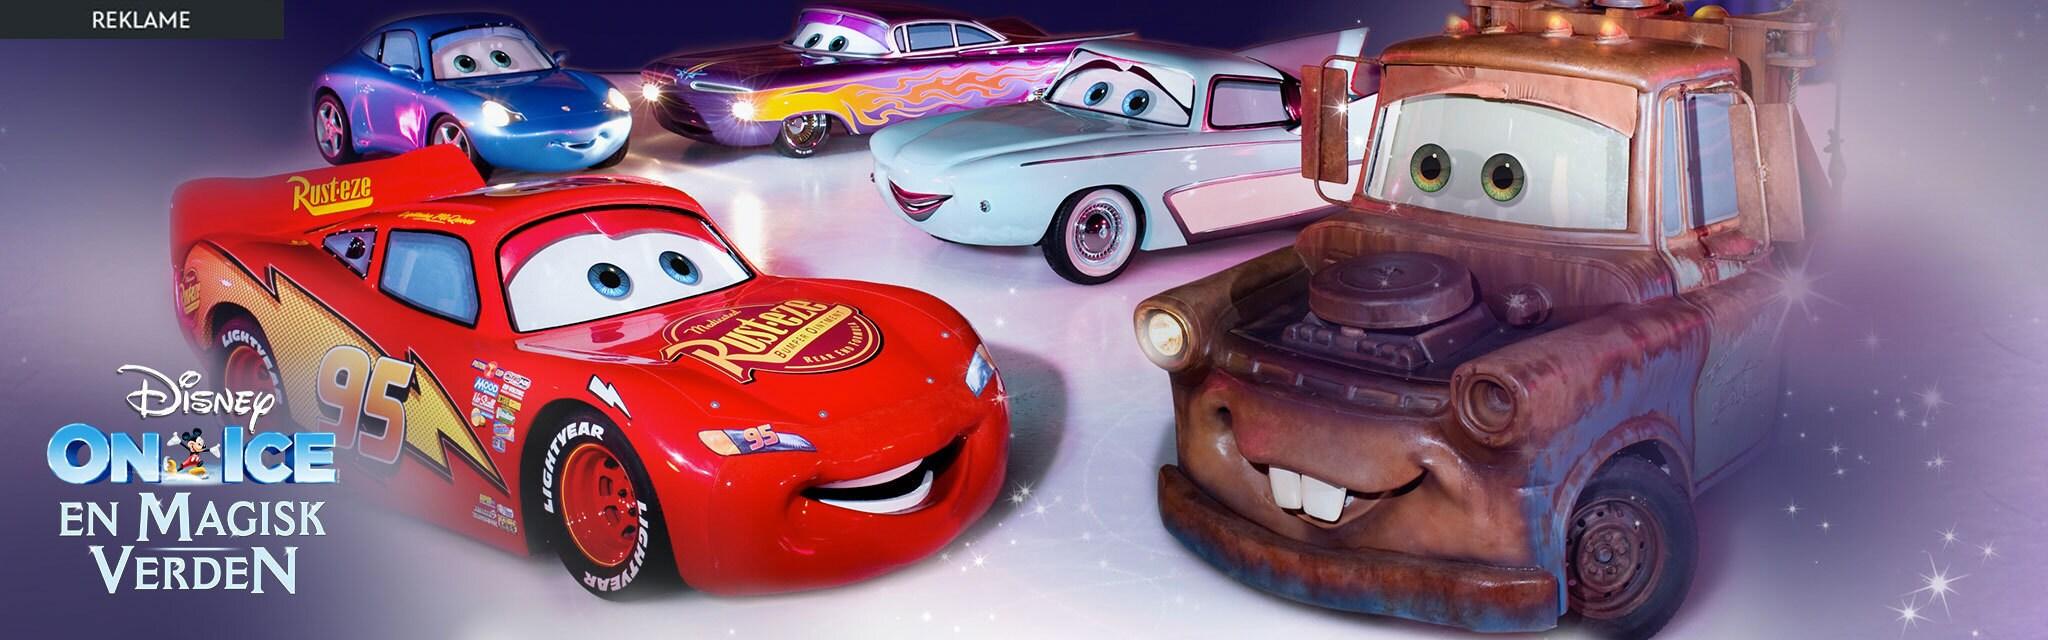 DOI - Worlds of Enchantment - Cars - Hero